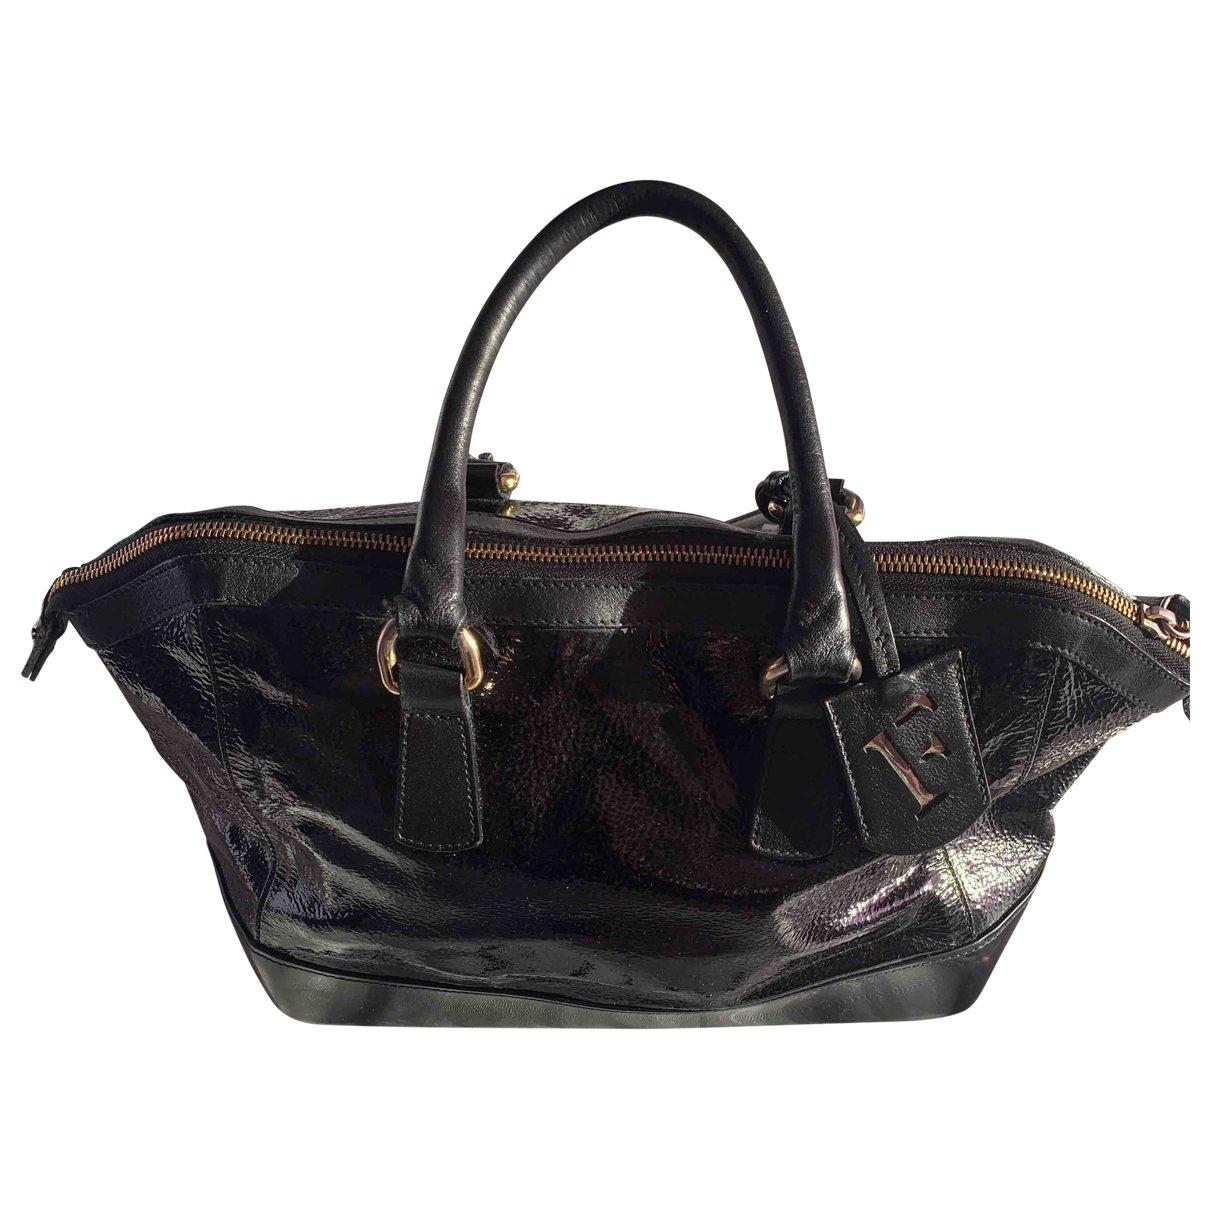 Furla \N Handtasche in  Schwarz Lackleder